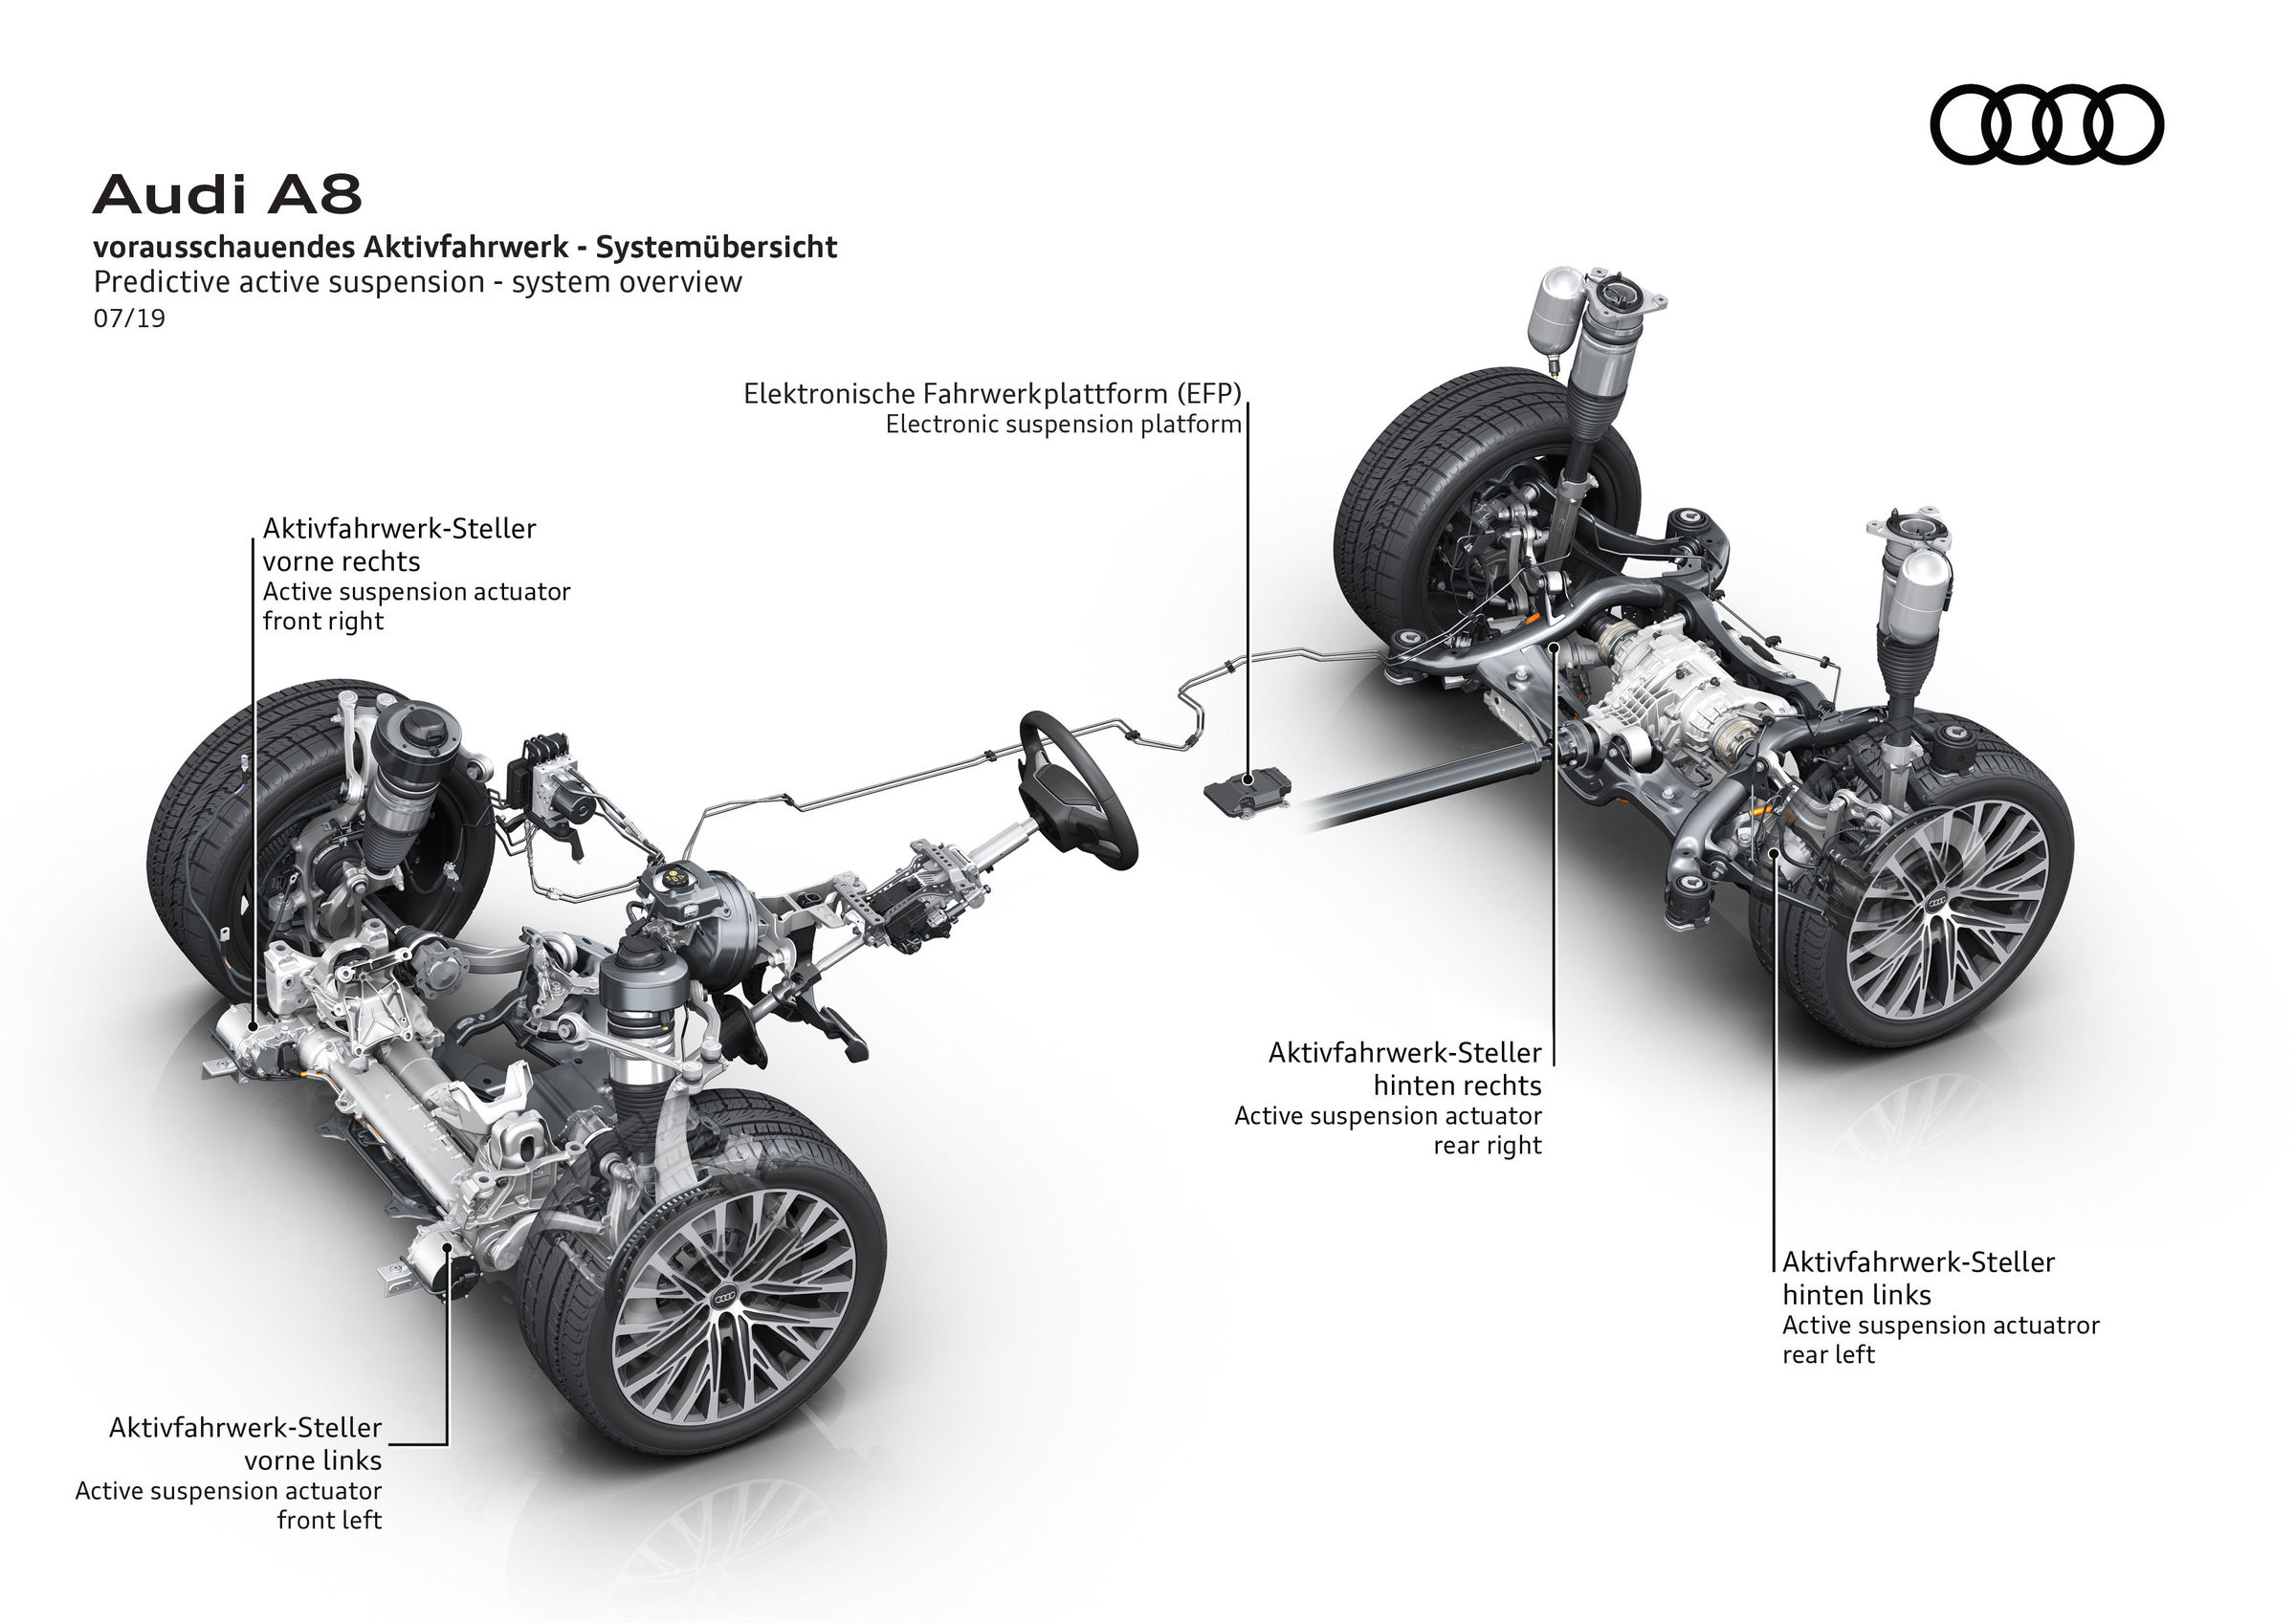 Audi A8 predictive active suspension